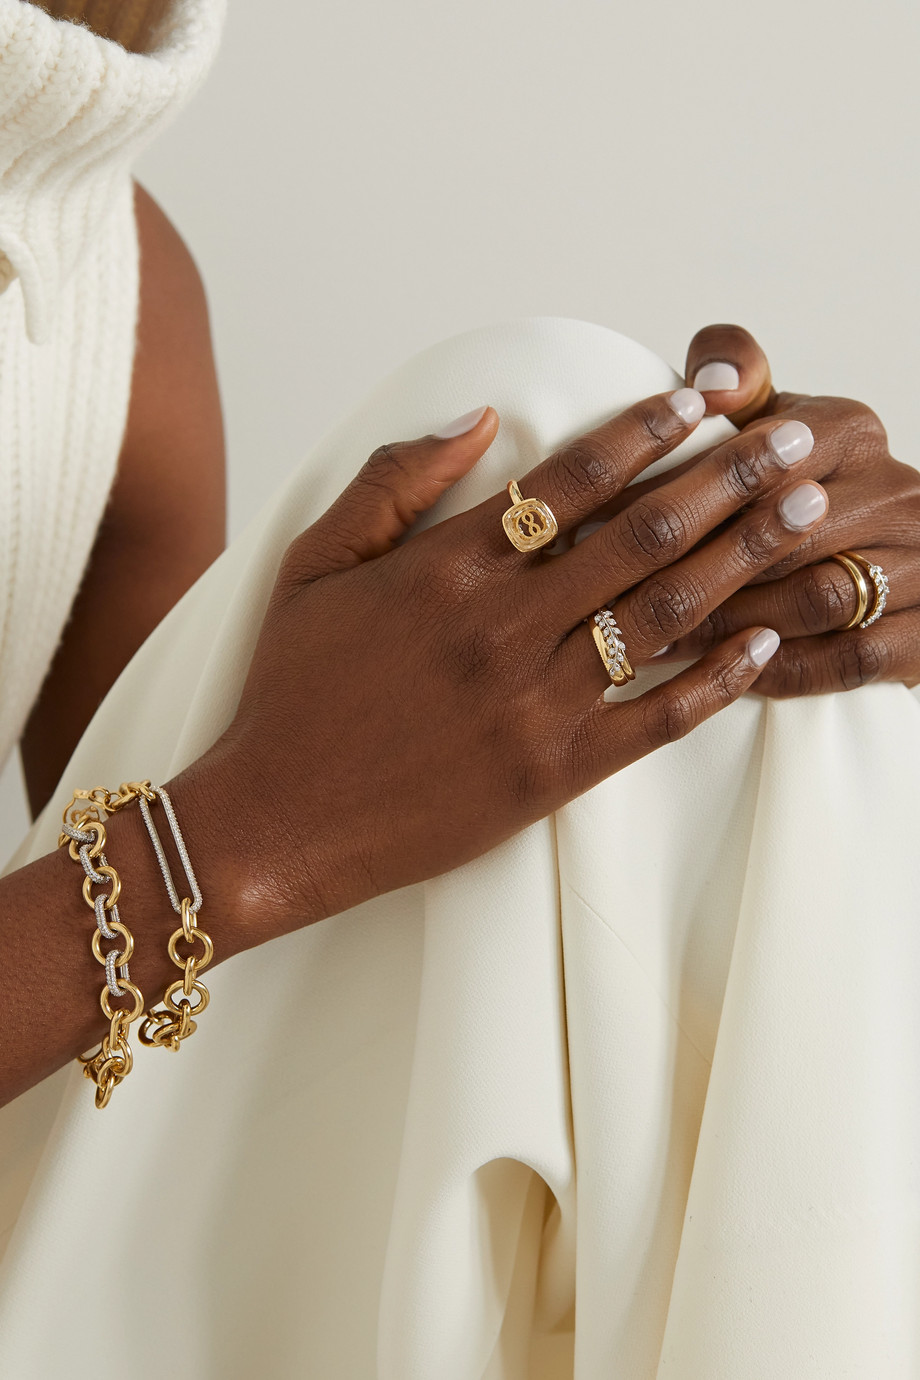 Foundrae Wholeness Ring aus 18 Karat Gold mit Quarz